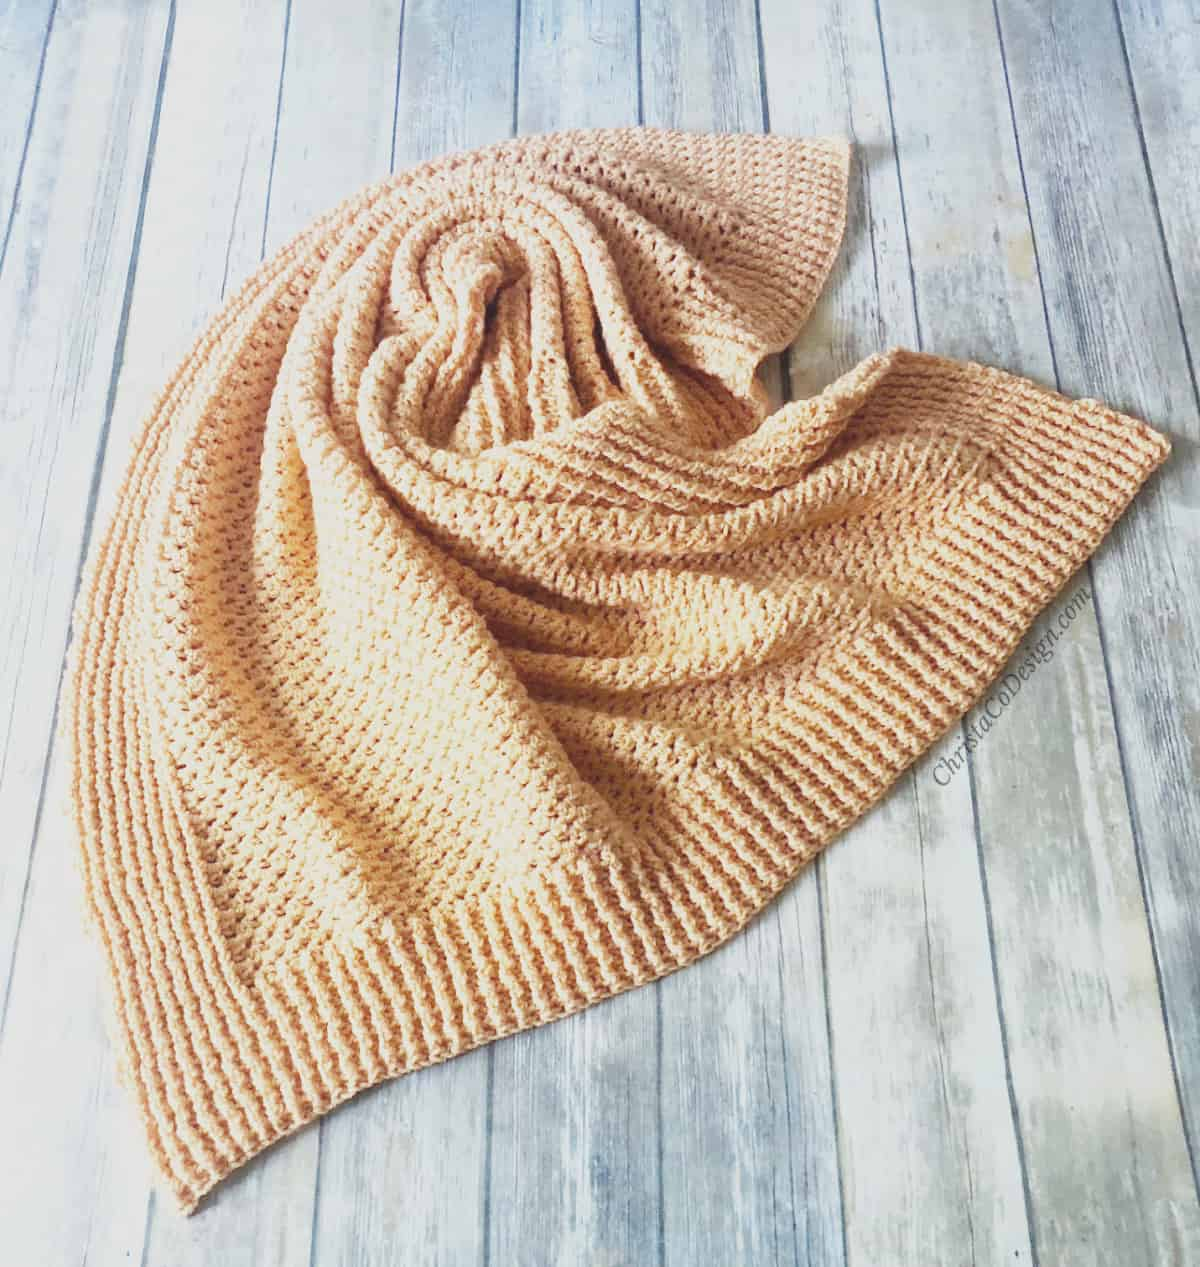 picture of orange crochet blanket twisted on wood floor